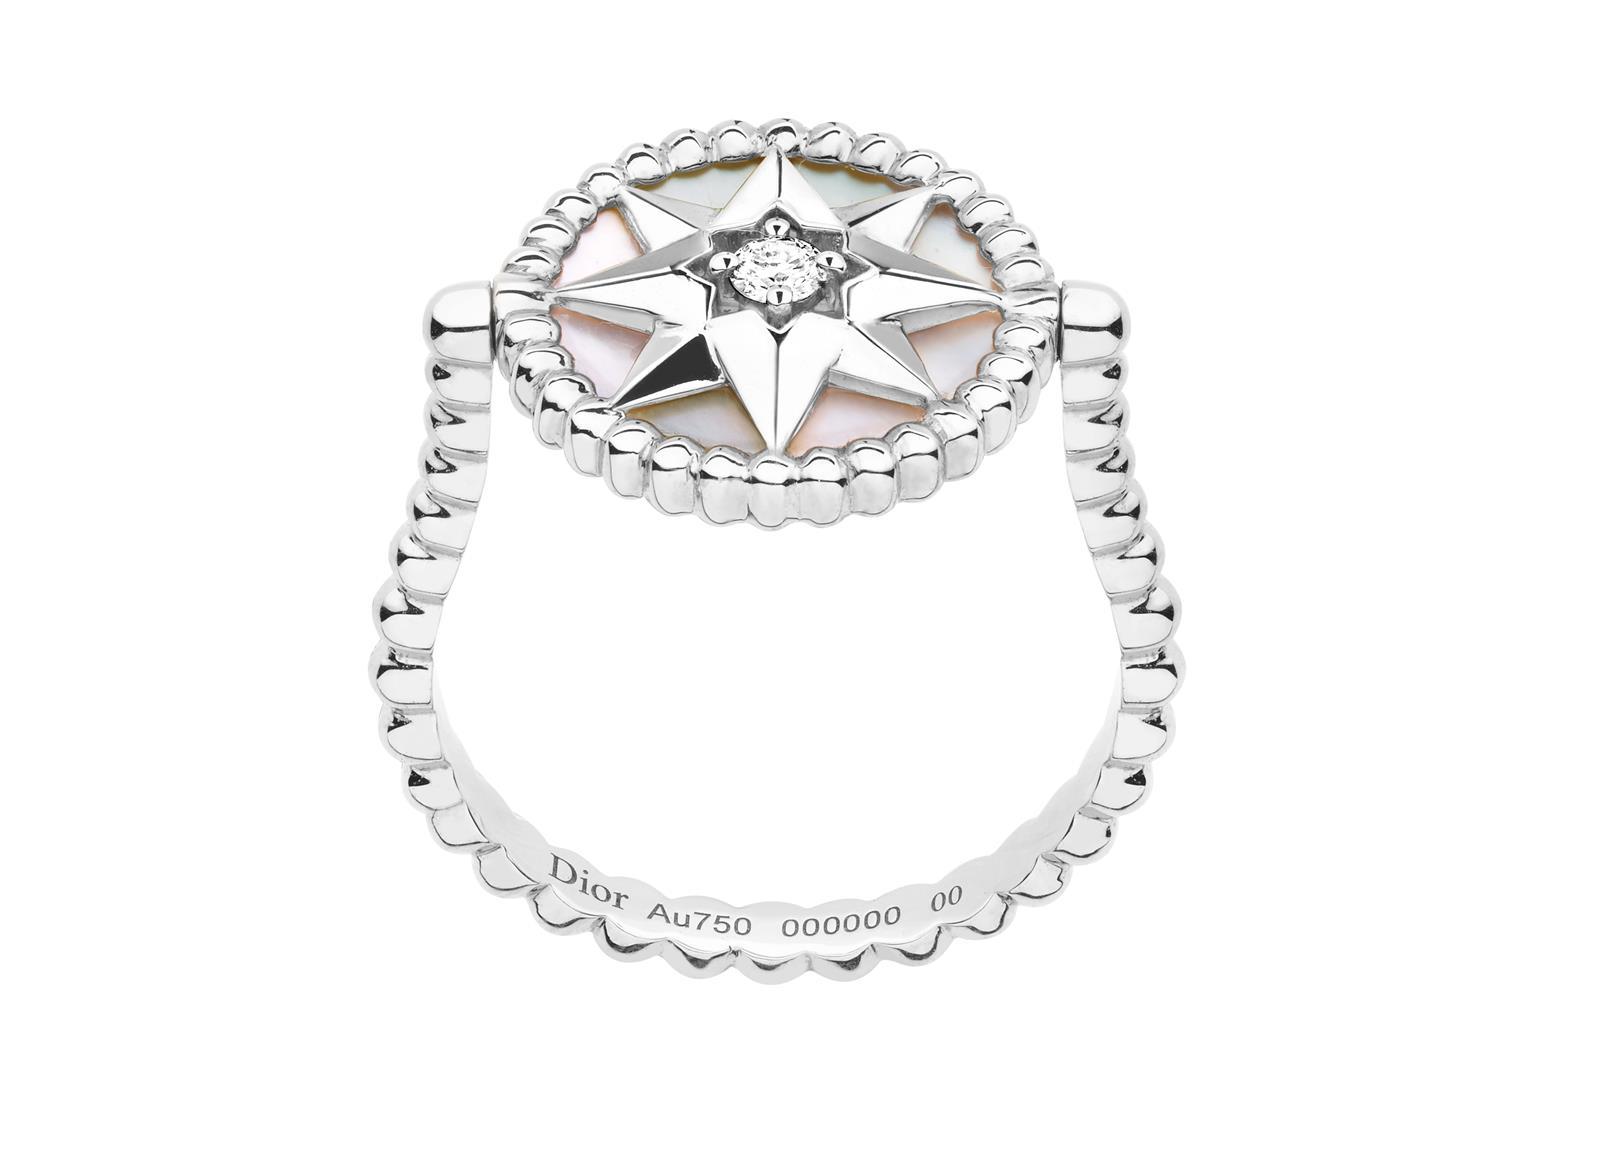 jewellery_JRDV95040_1 (Copy)